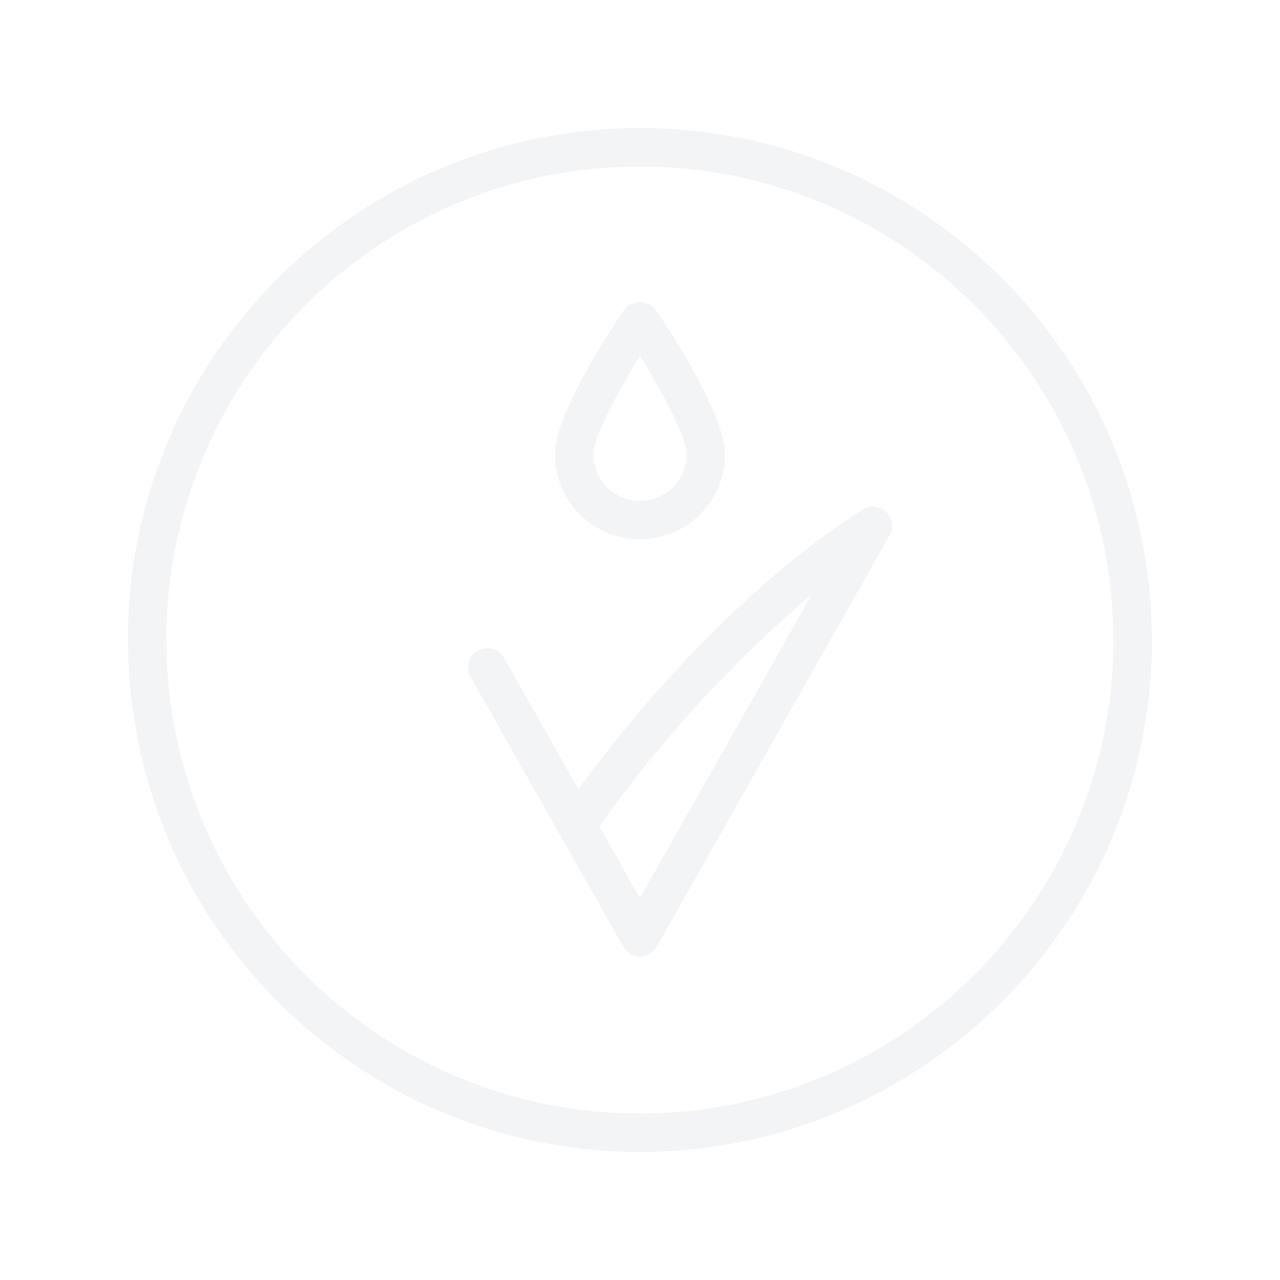 Makeup Revolution I Love Makeup Chocolate Palette I Heart Chocolate 22g